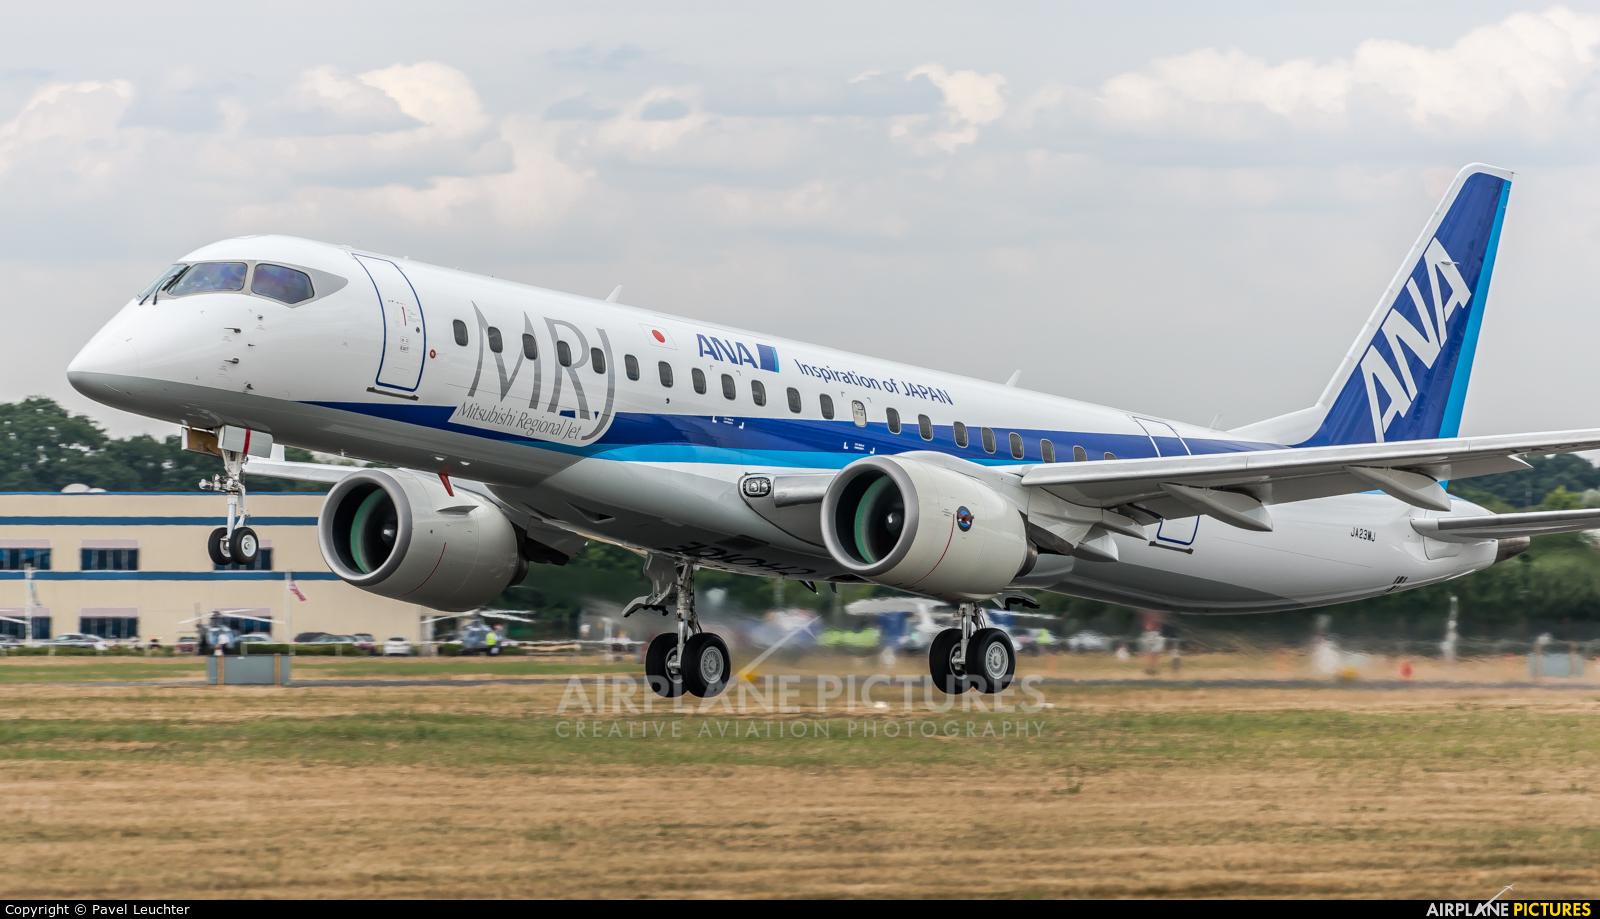 ANA - All Nippon Airways JA23MJ aircraft at Farnborough